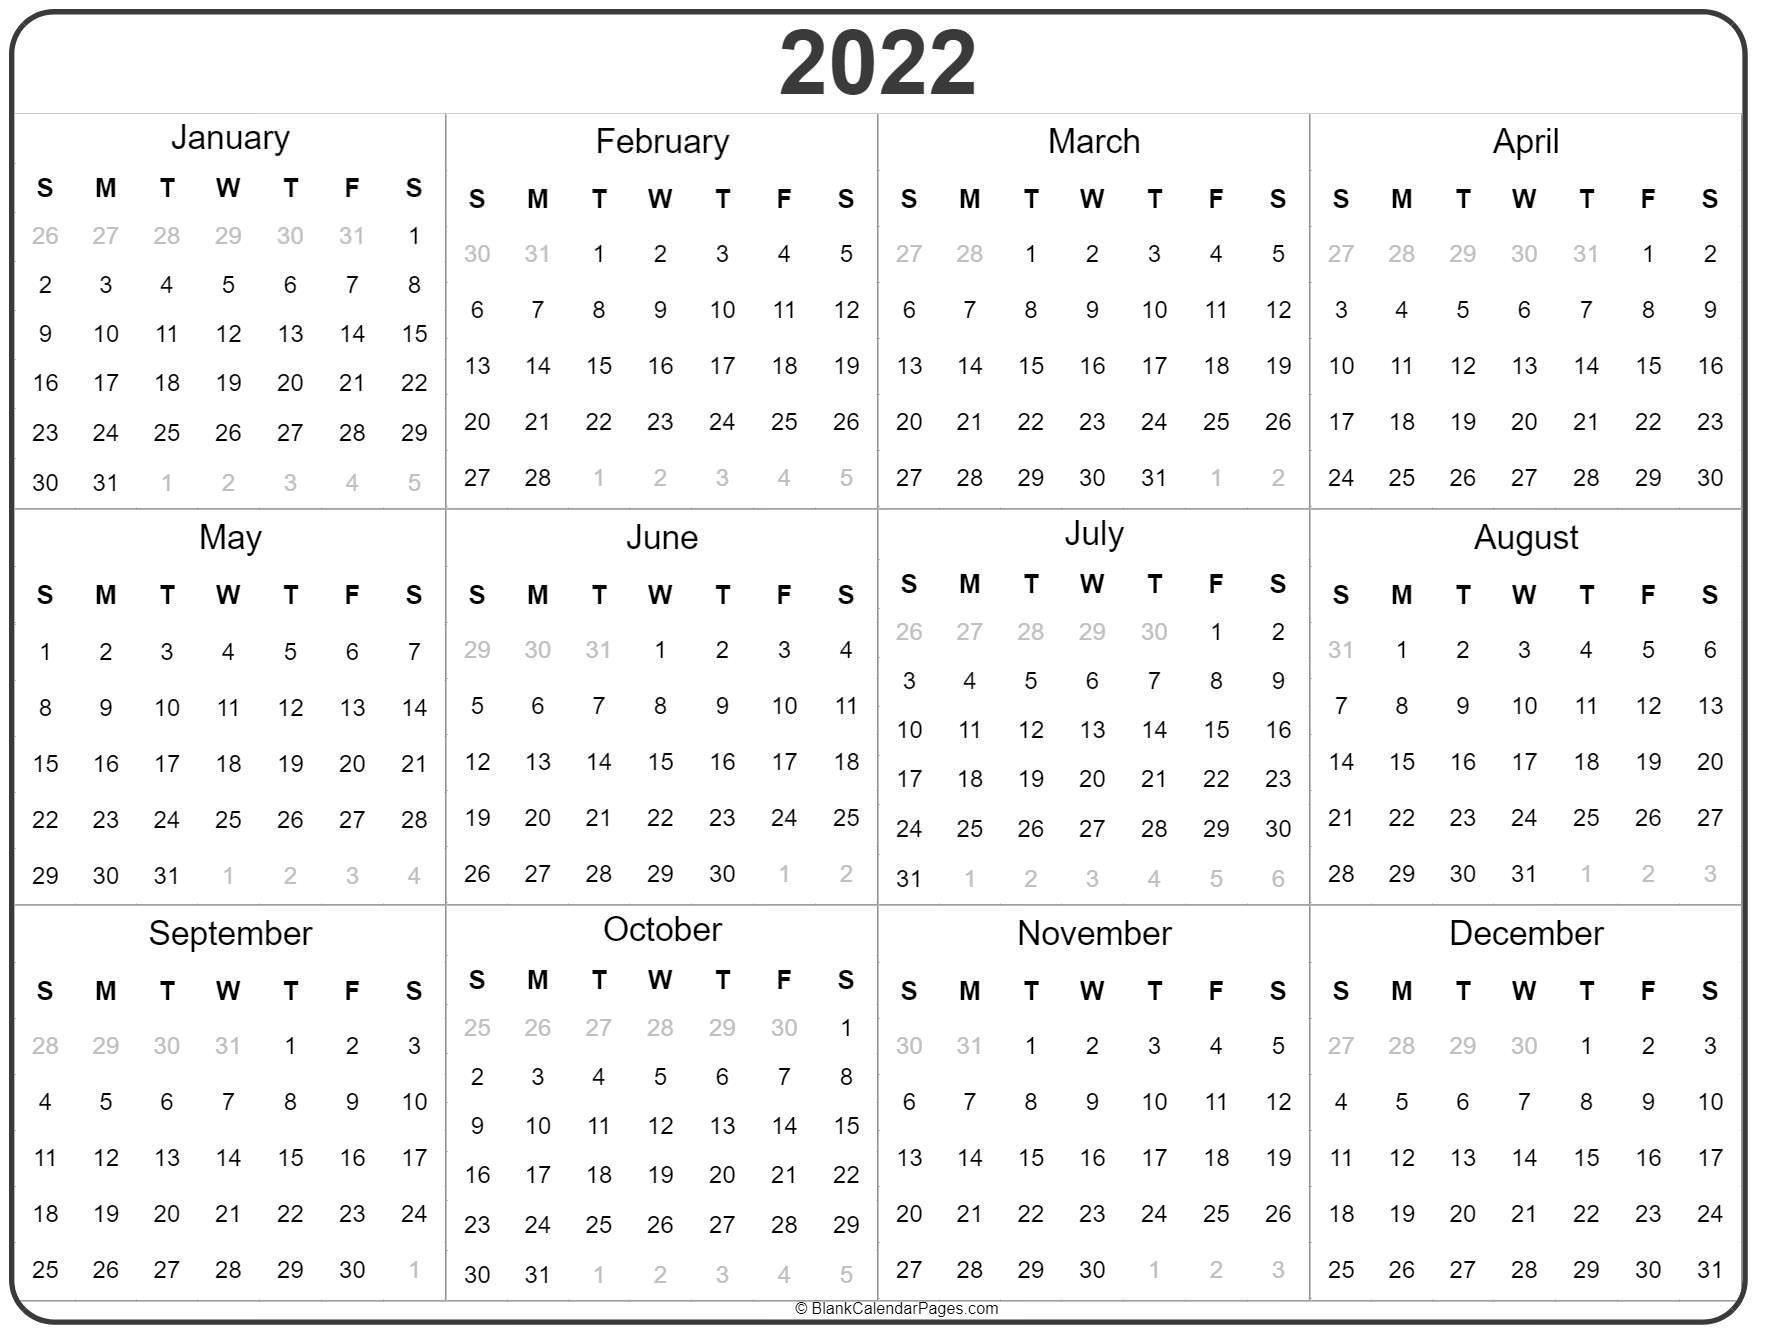 2022 Year Calendar | Yearly Printable